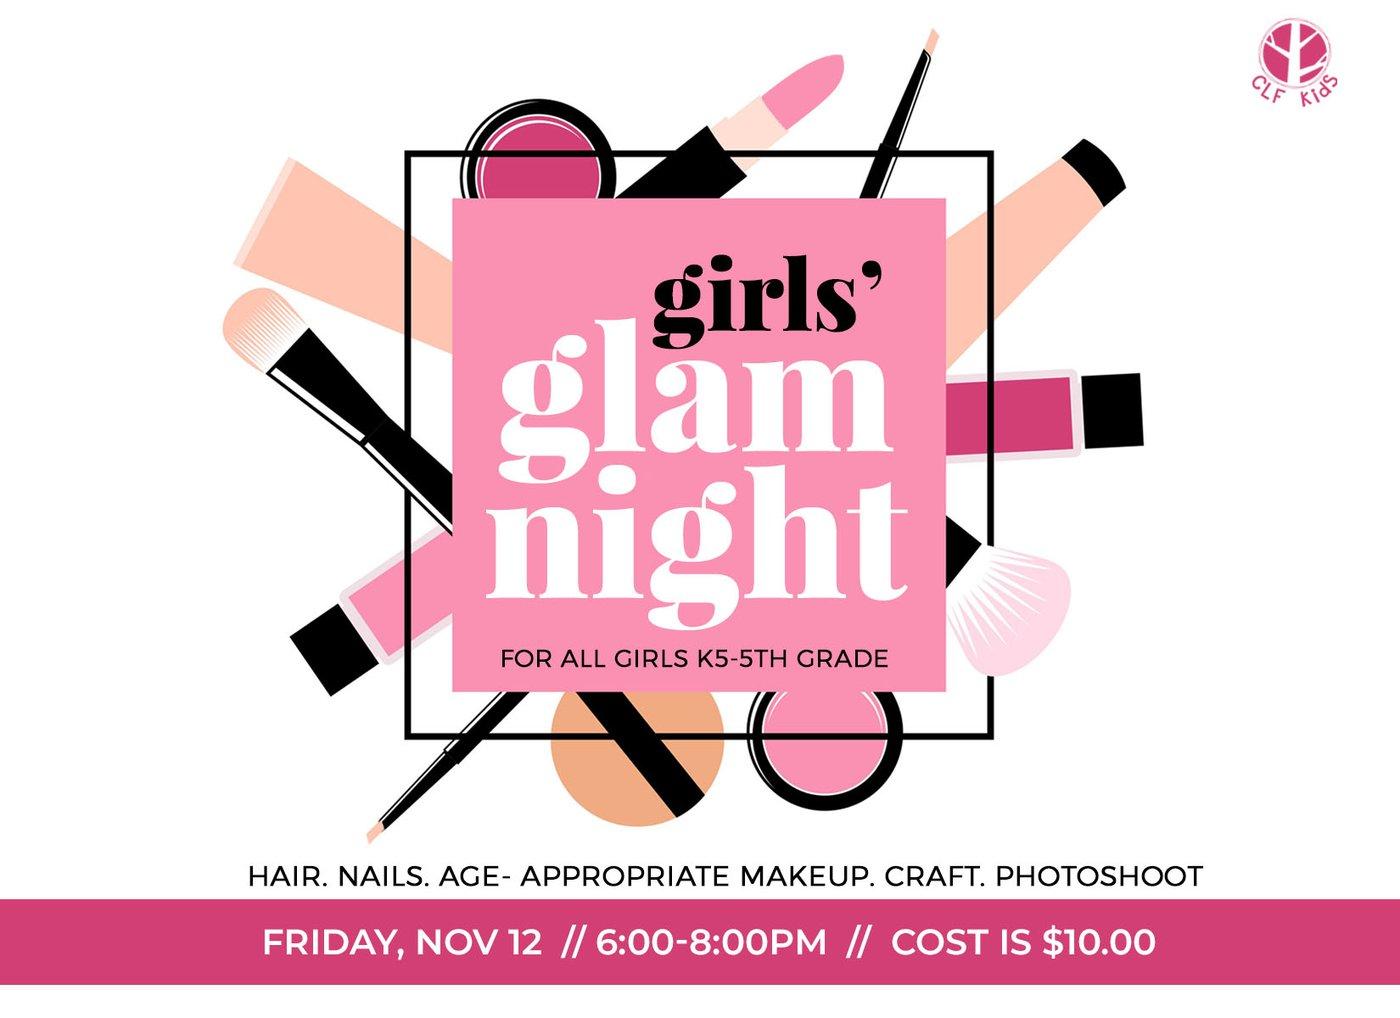 Girls Glam Night